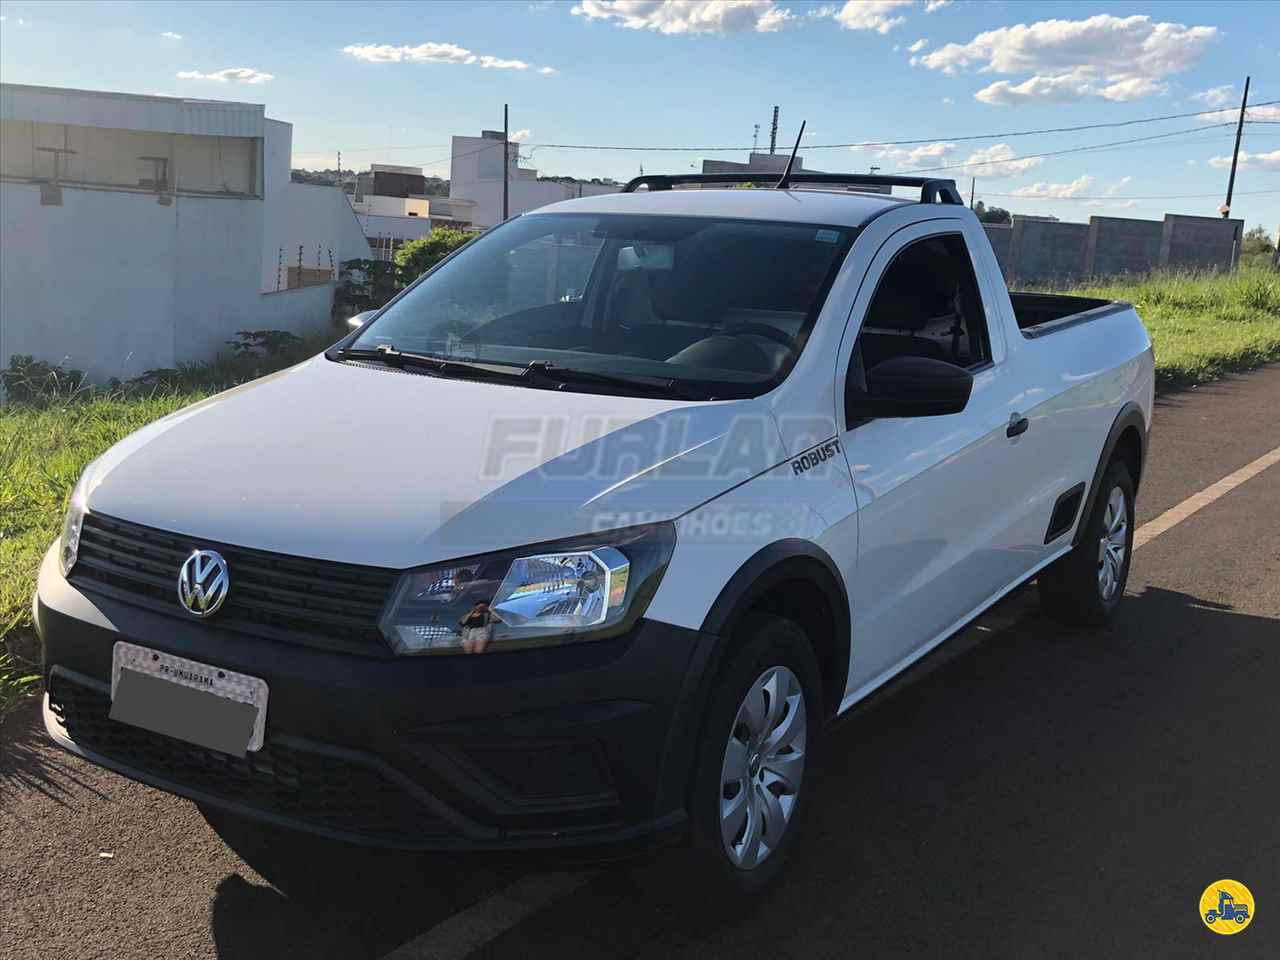 CARRO VW - Volkswagen Saveiro 1.6 Robust Furlan Caminhões UMUARAMA PARANÁ PR